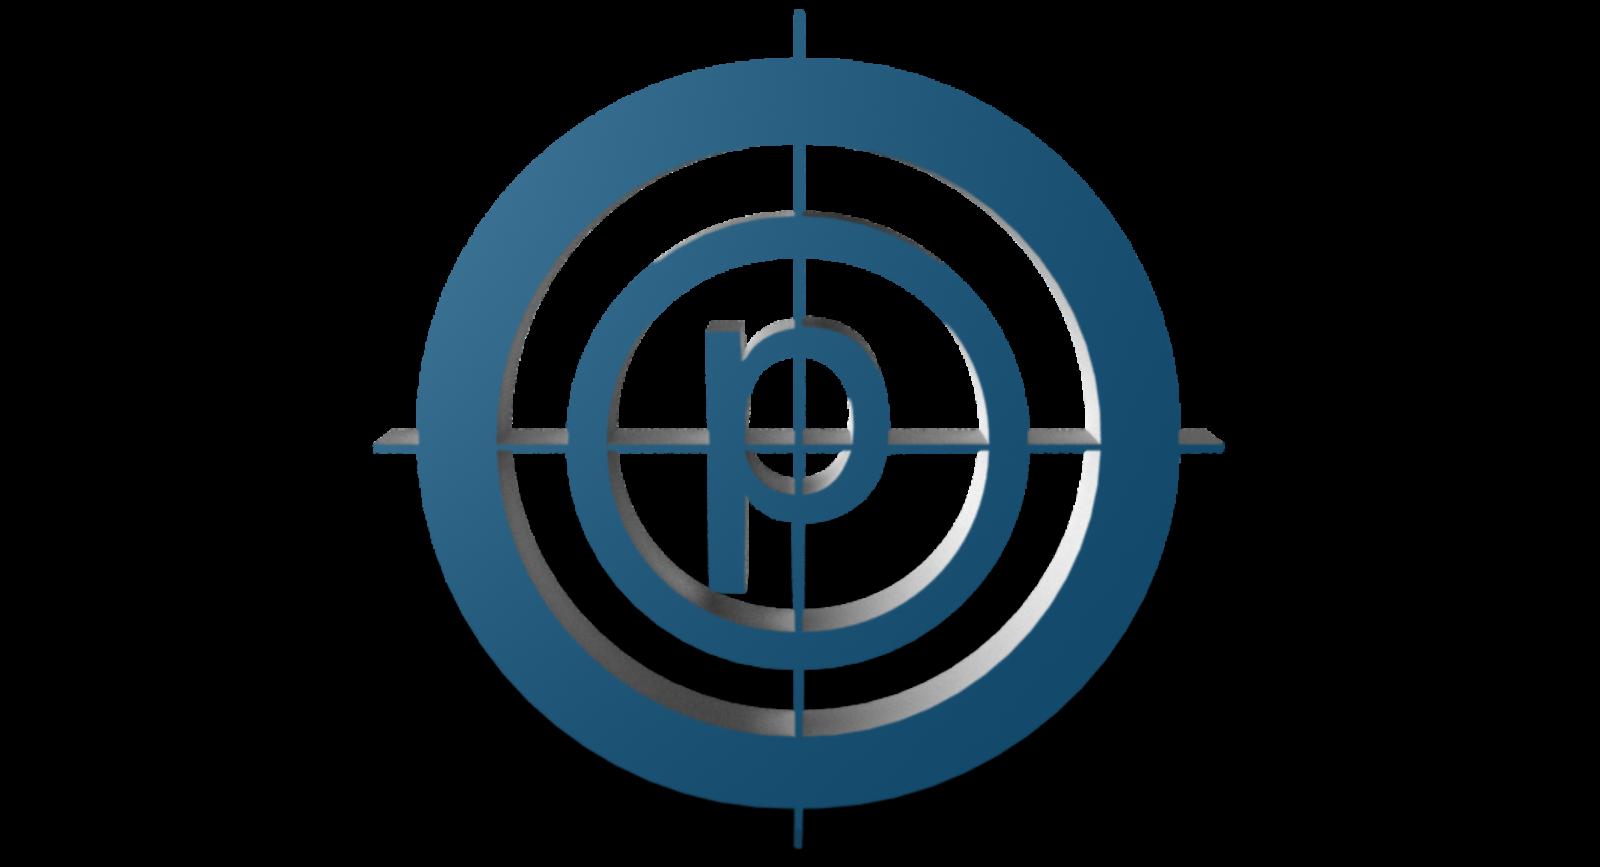 cropped-PureEstimates-3D-logo-final.png